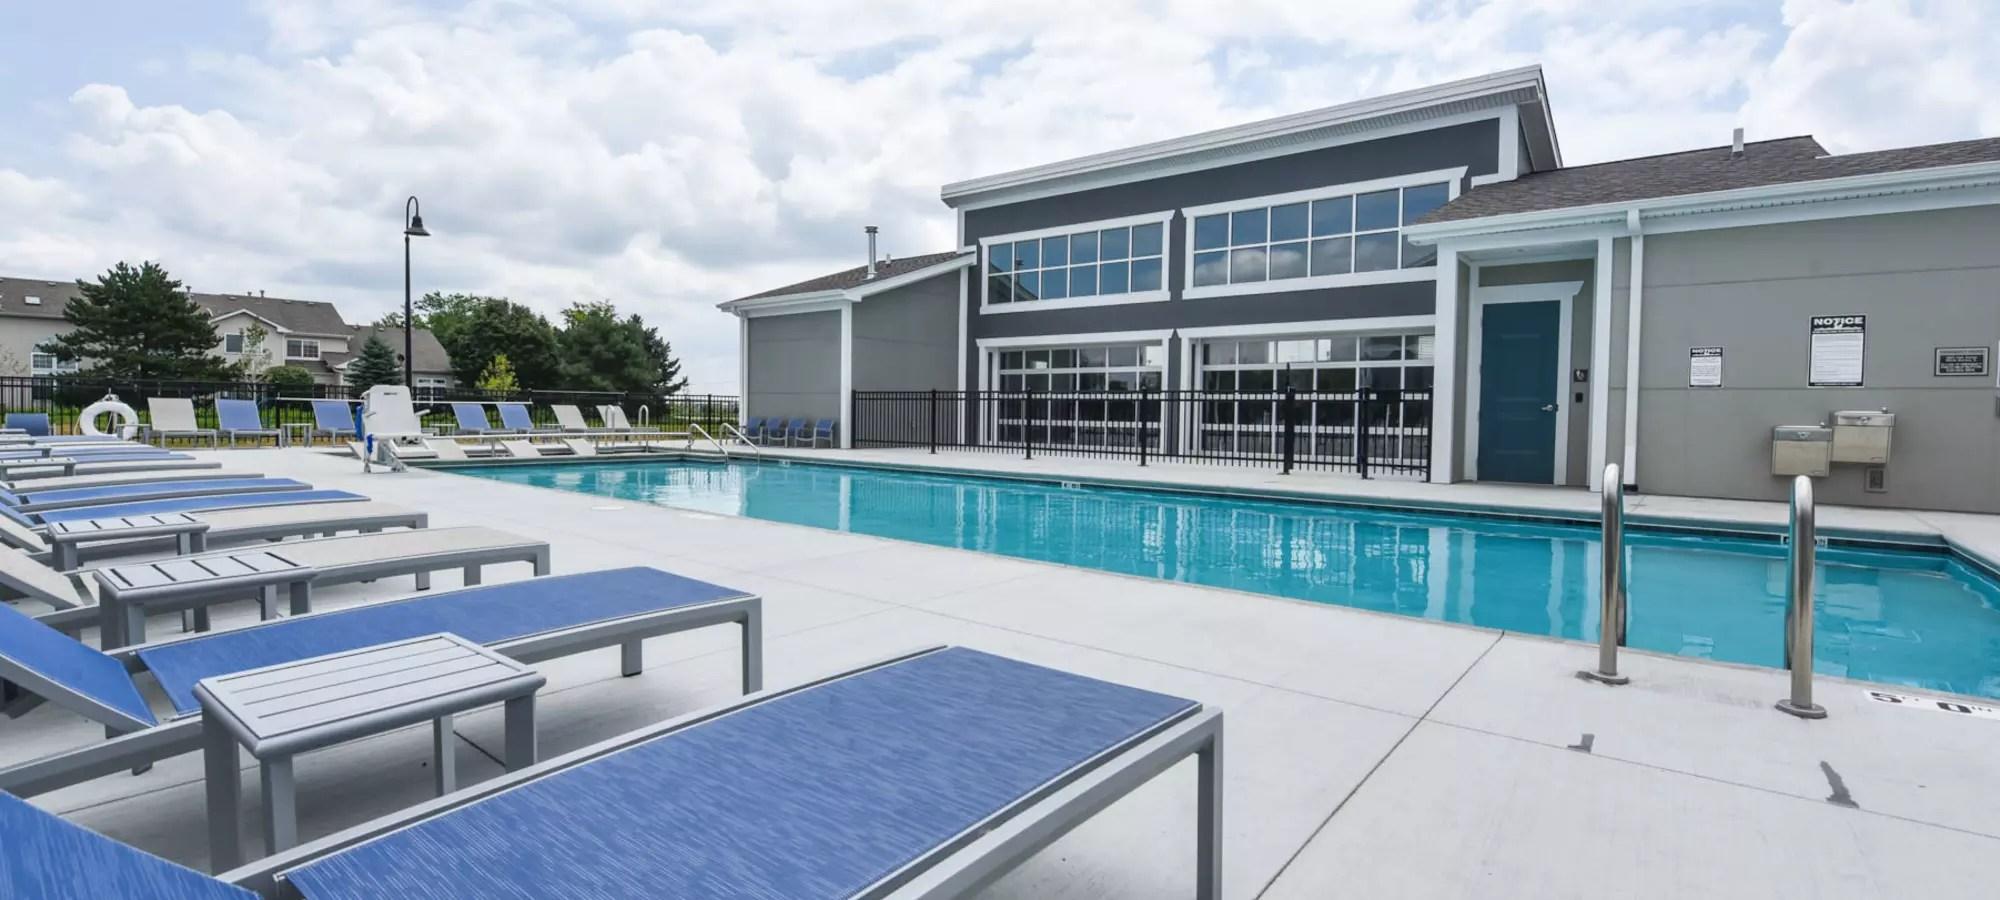 North Aurora, IL Luxury Apartments For Rent